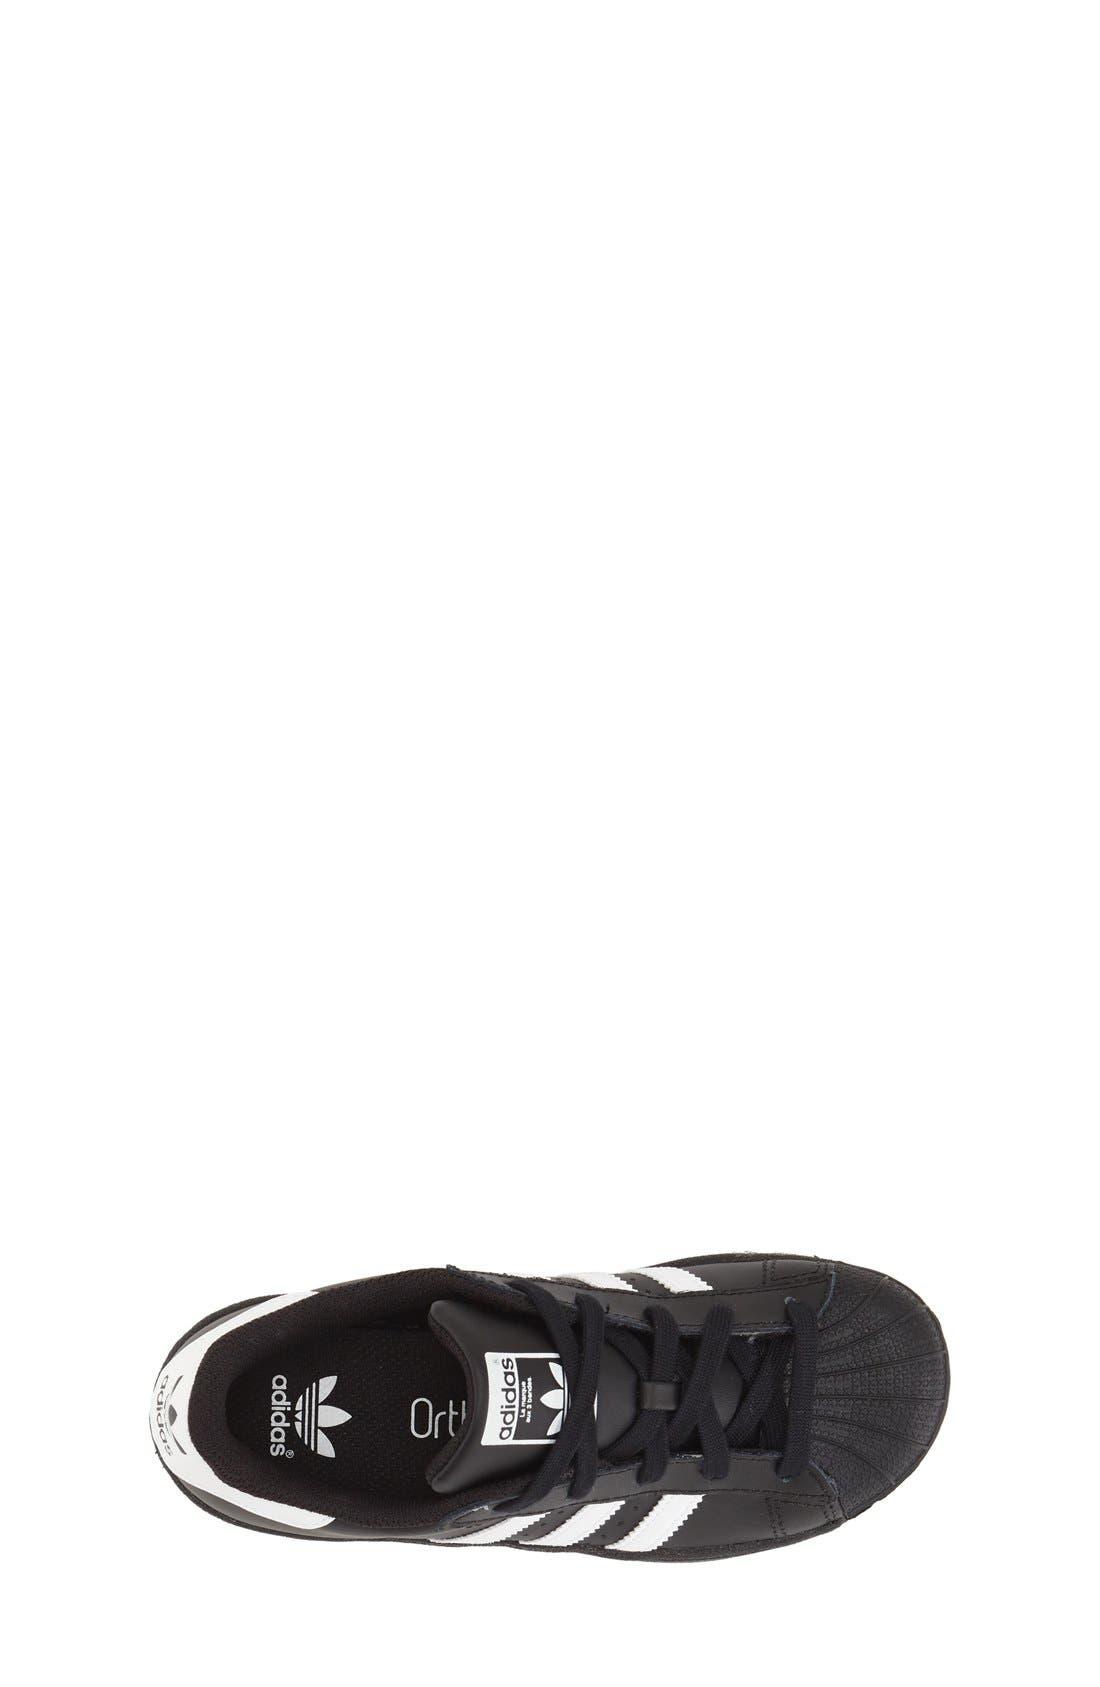 Alternate Image 3  - adidas 'Superstar' Sneaker (Baby, Walker, Toddler, Little Kid & Big Kid)